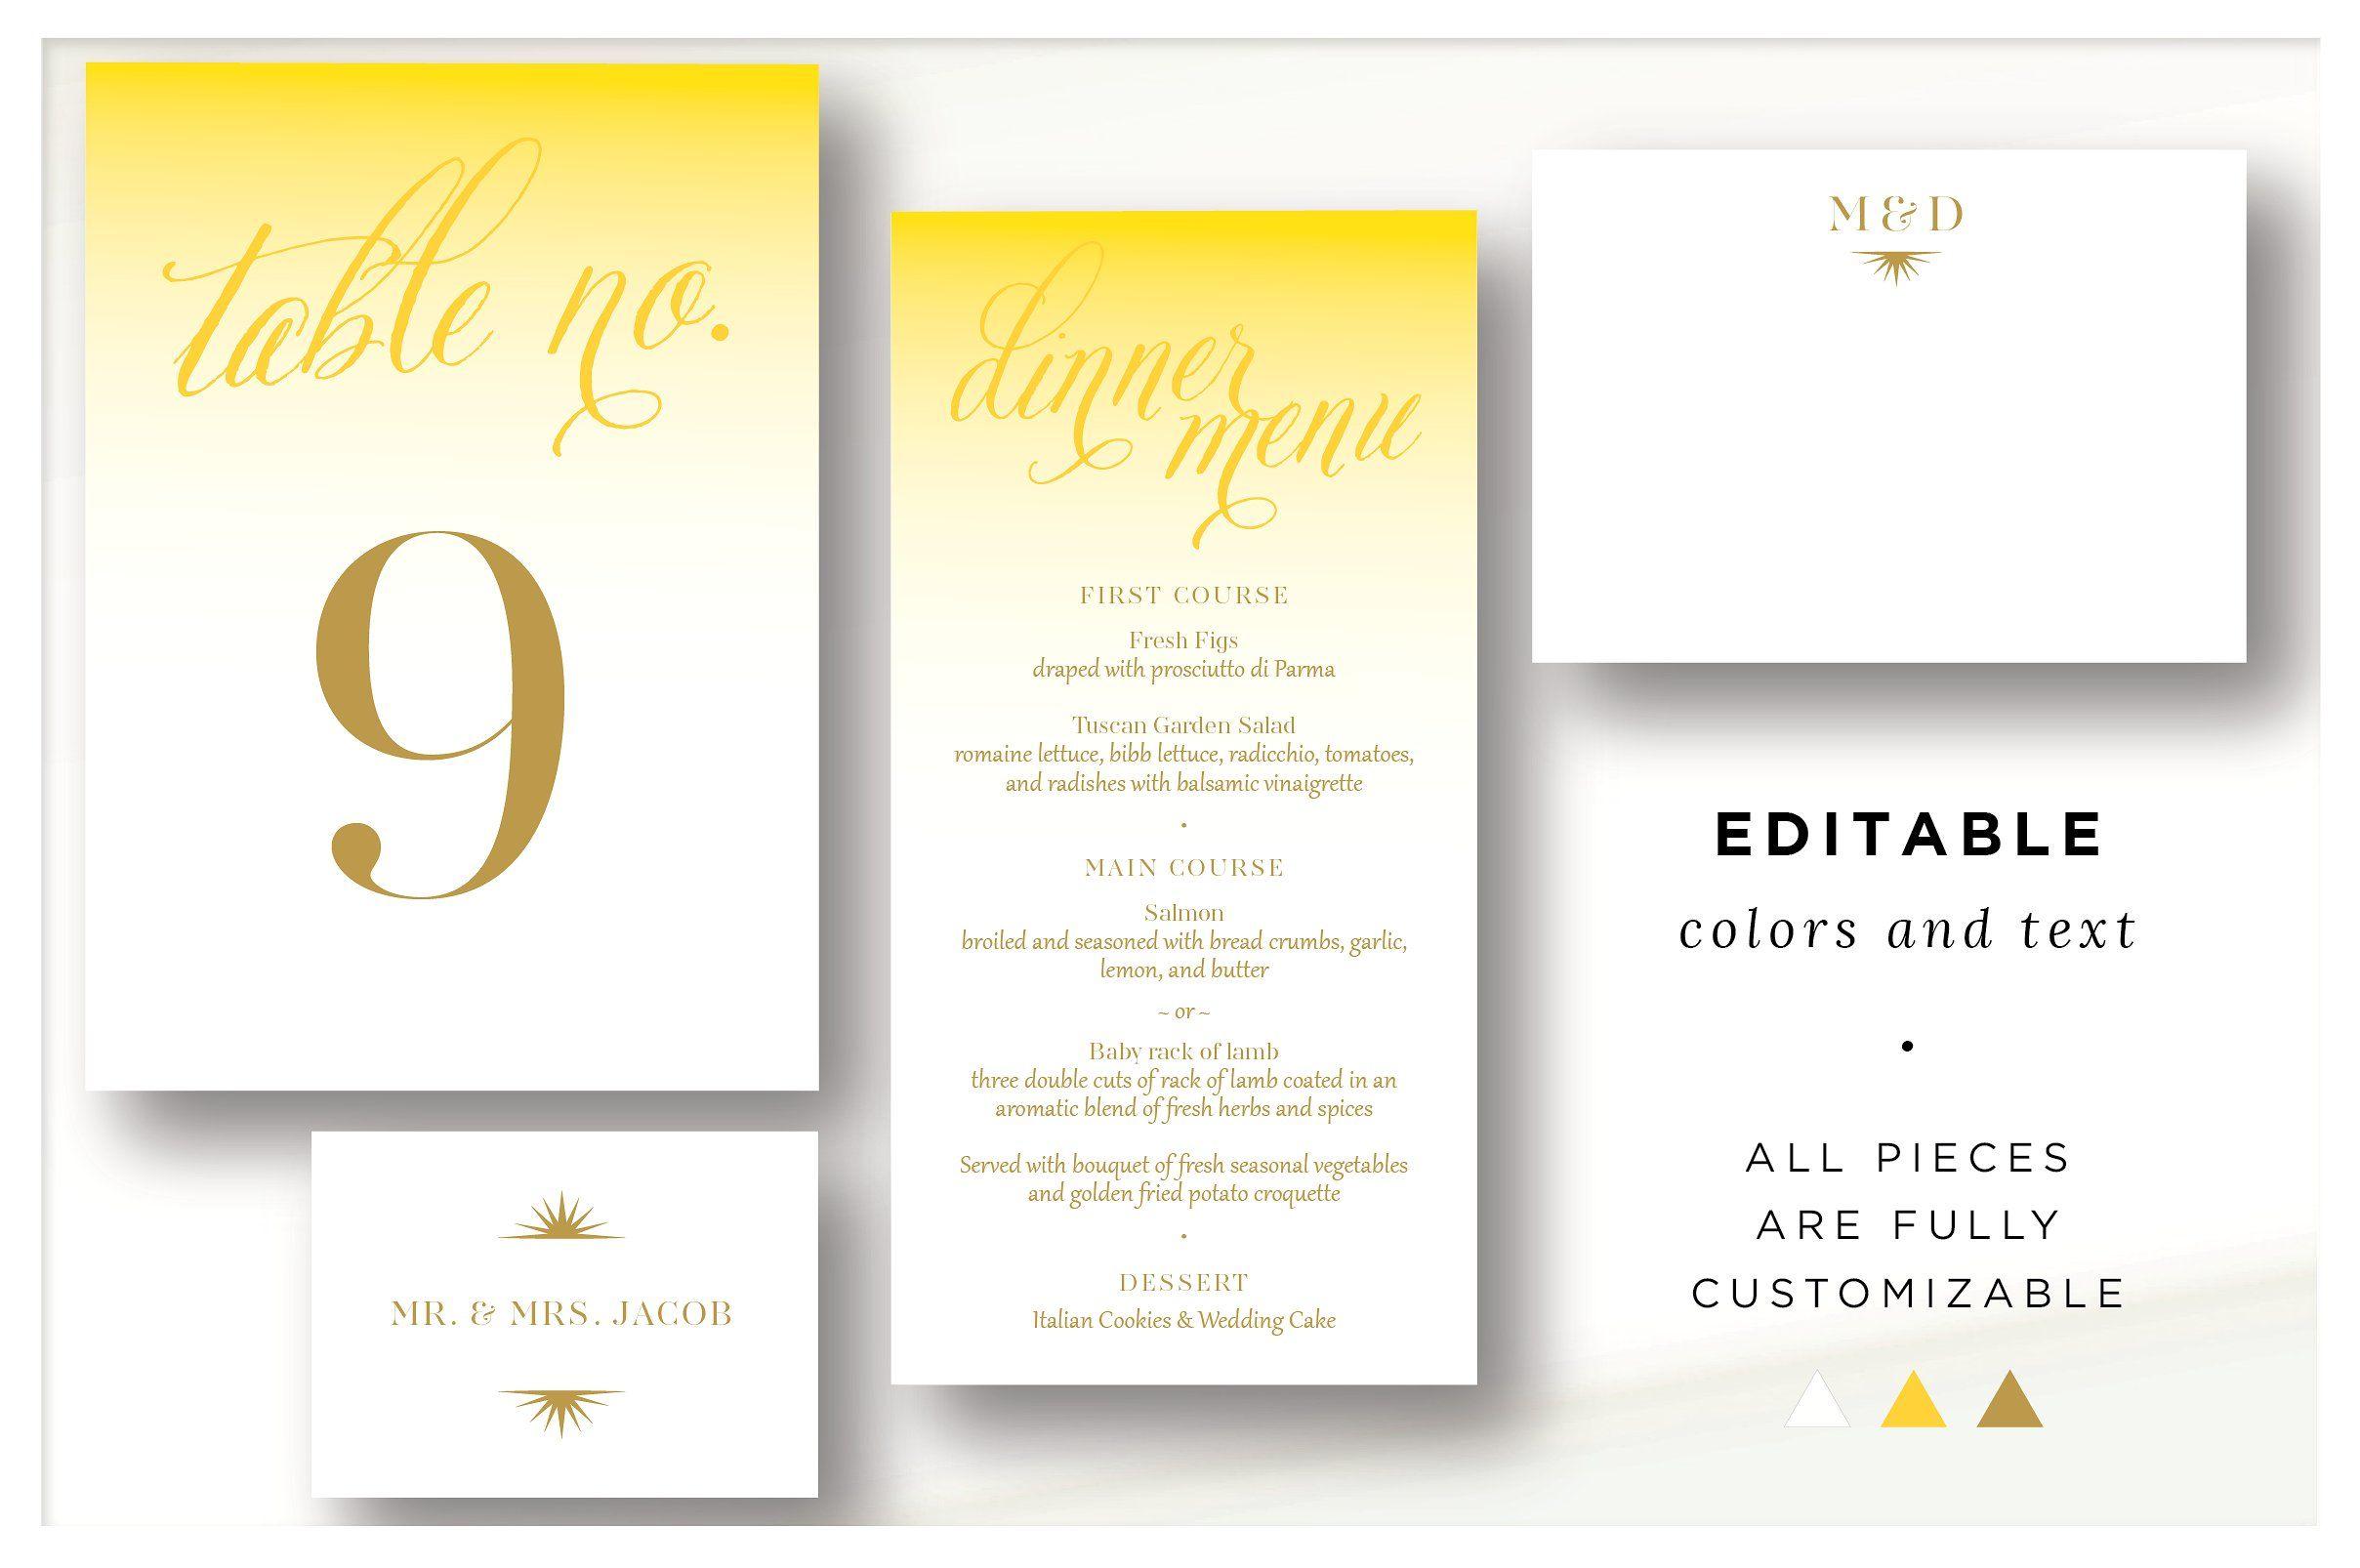 Surya Wedding Invitations Diy Printable Wedding Invitations Fun Wedding Invitations Wedding Invitations